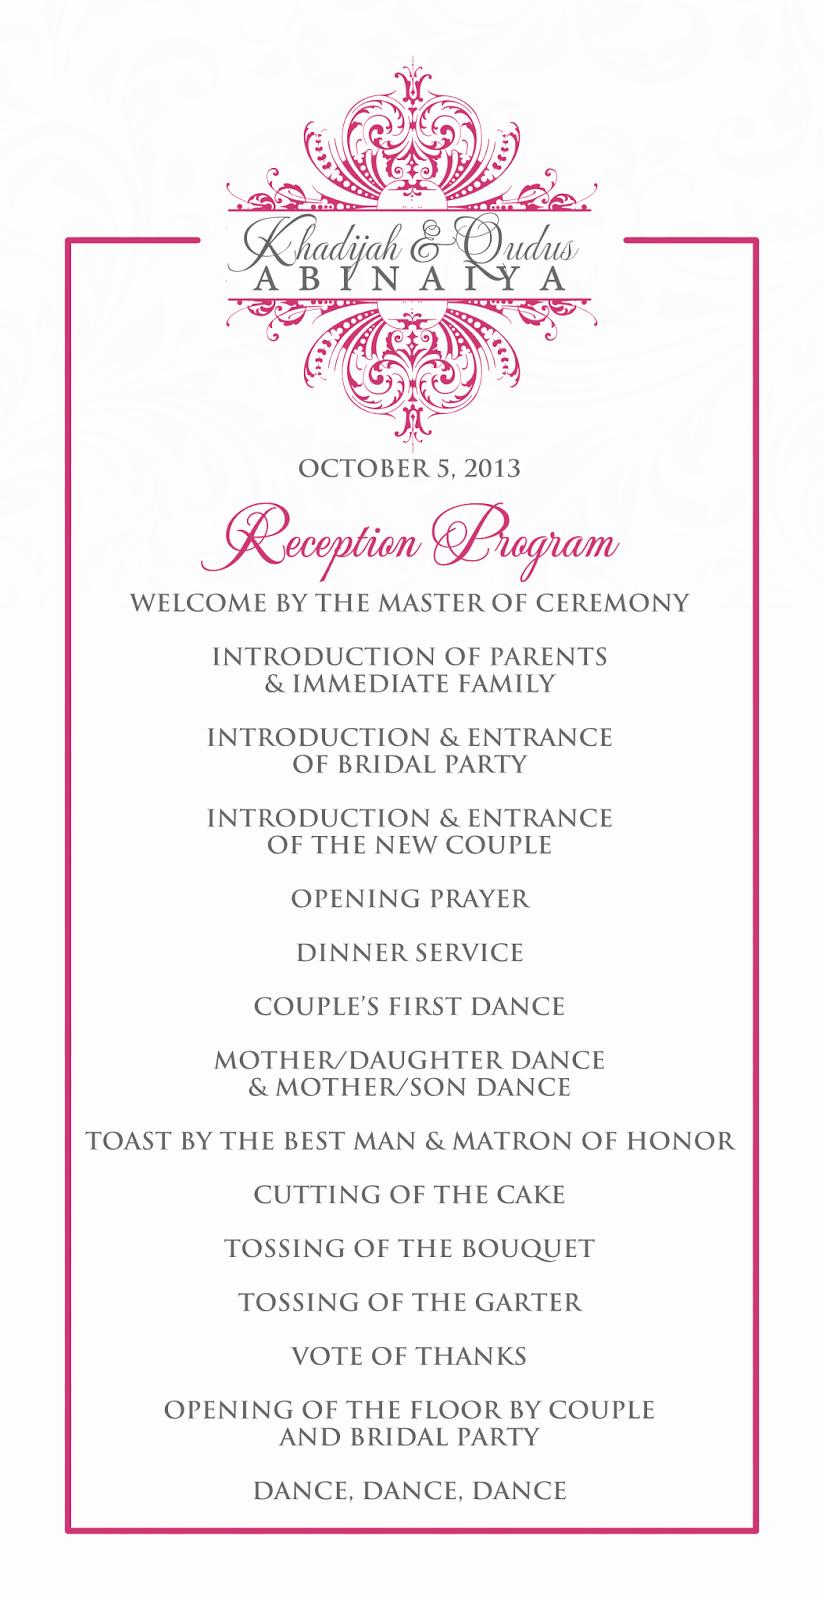 Wedding Program Outline Template